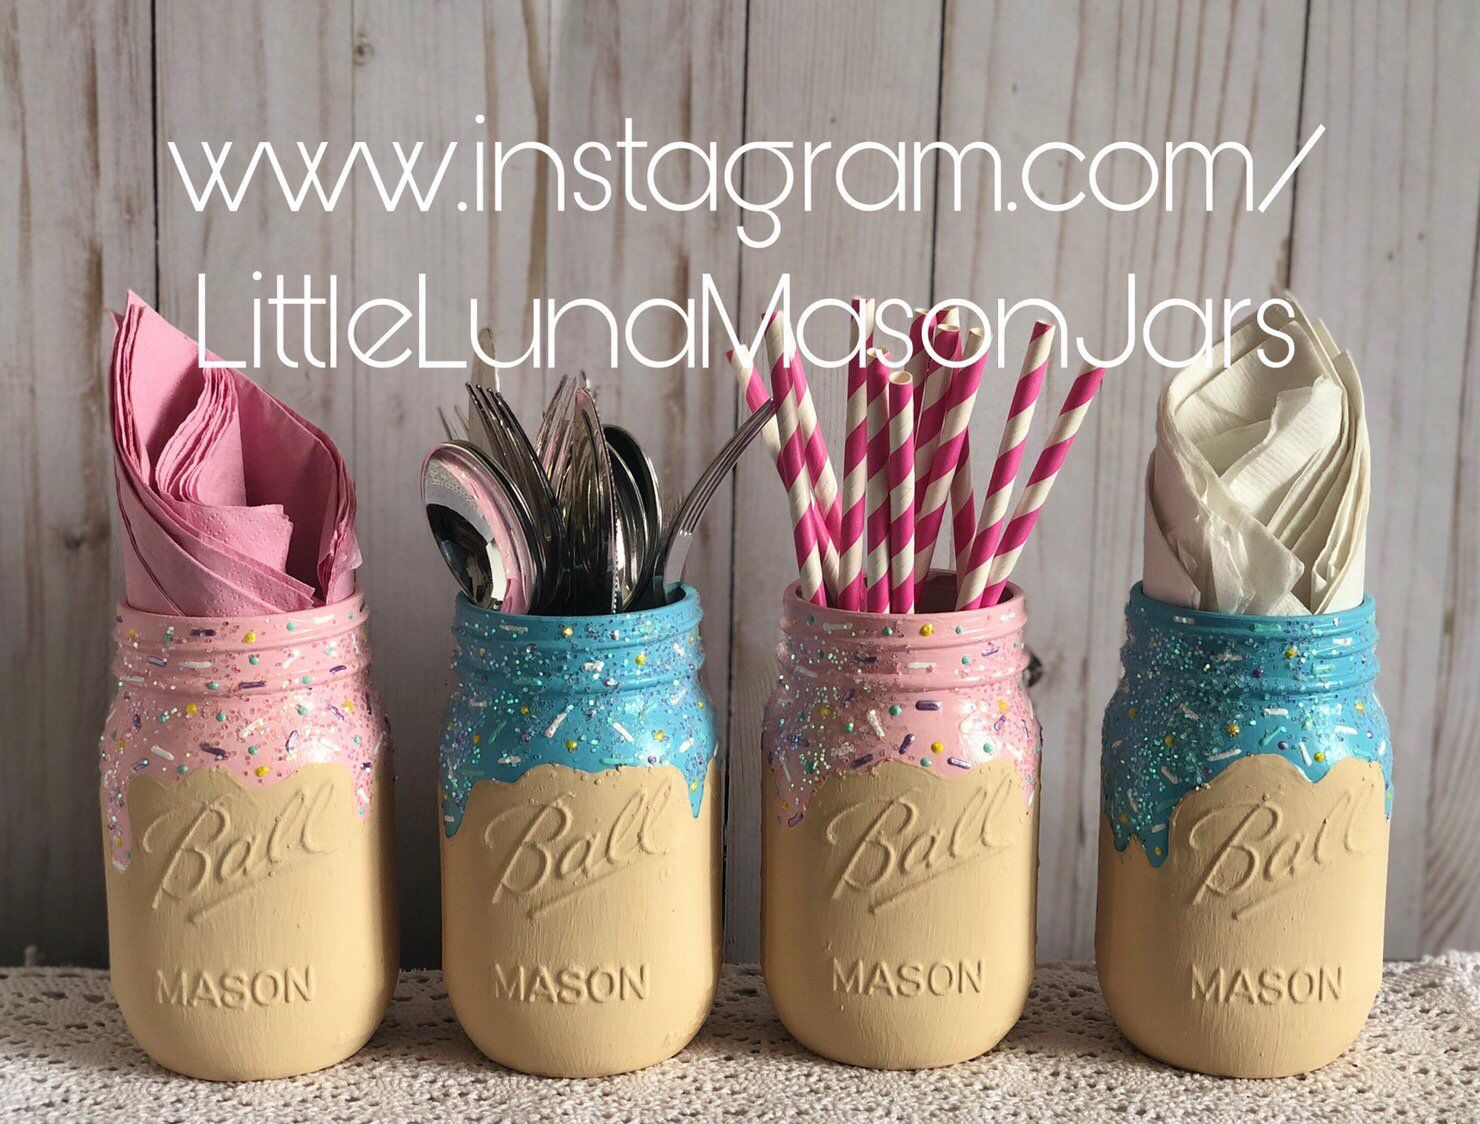 Gender reveal ice cream party, set of 4 pint sized jars, pink & blue ice cream jars, birthday party decor, desert table centerpiece #icecreambirthdayparty